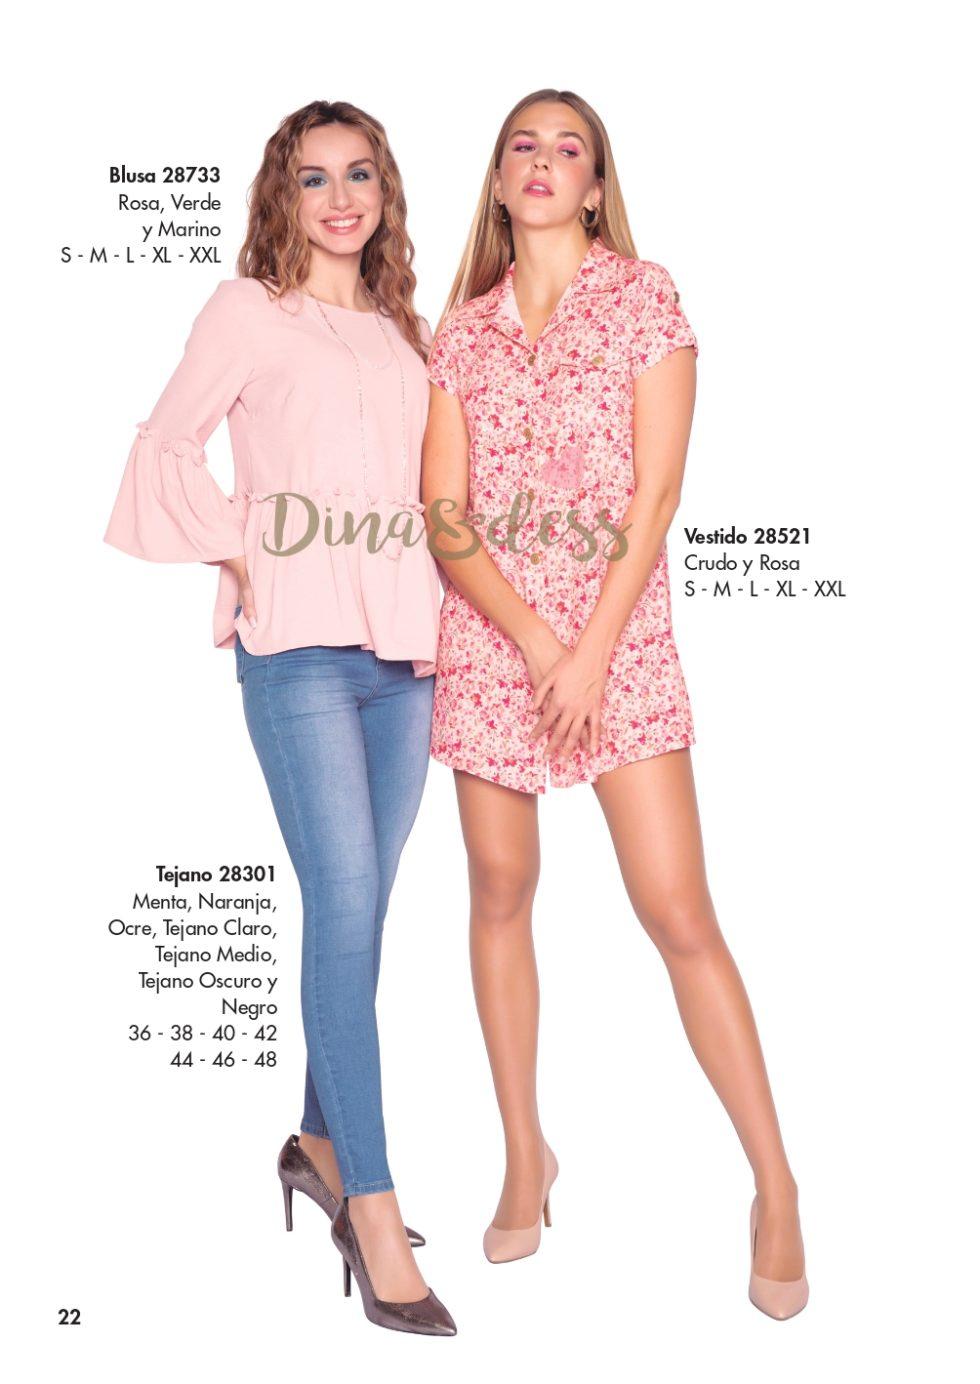 Verano 2021 Dina&Dess Clientes_page-0024